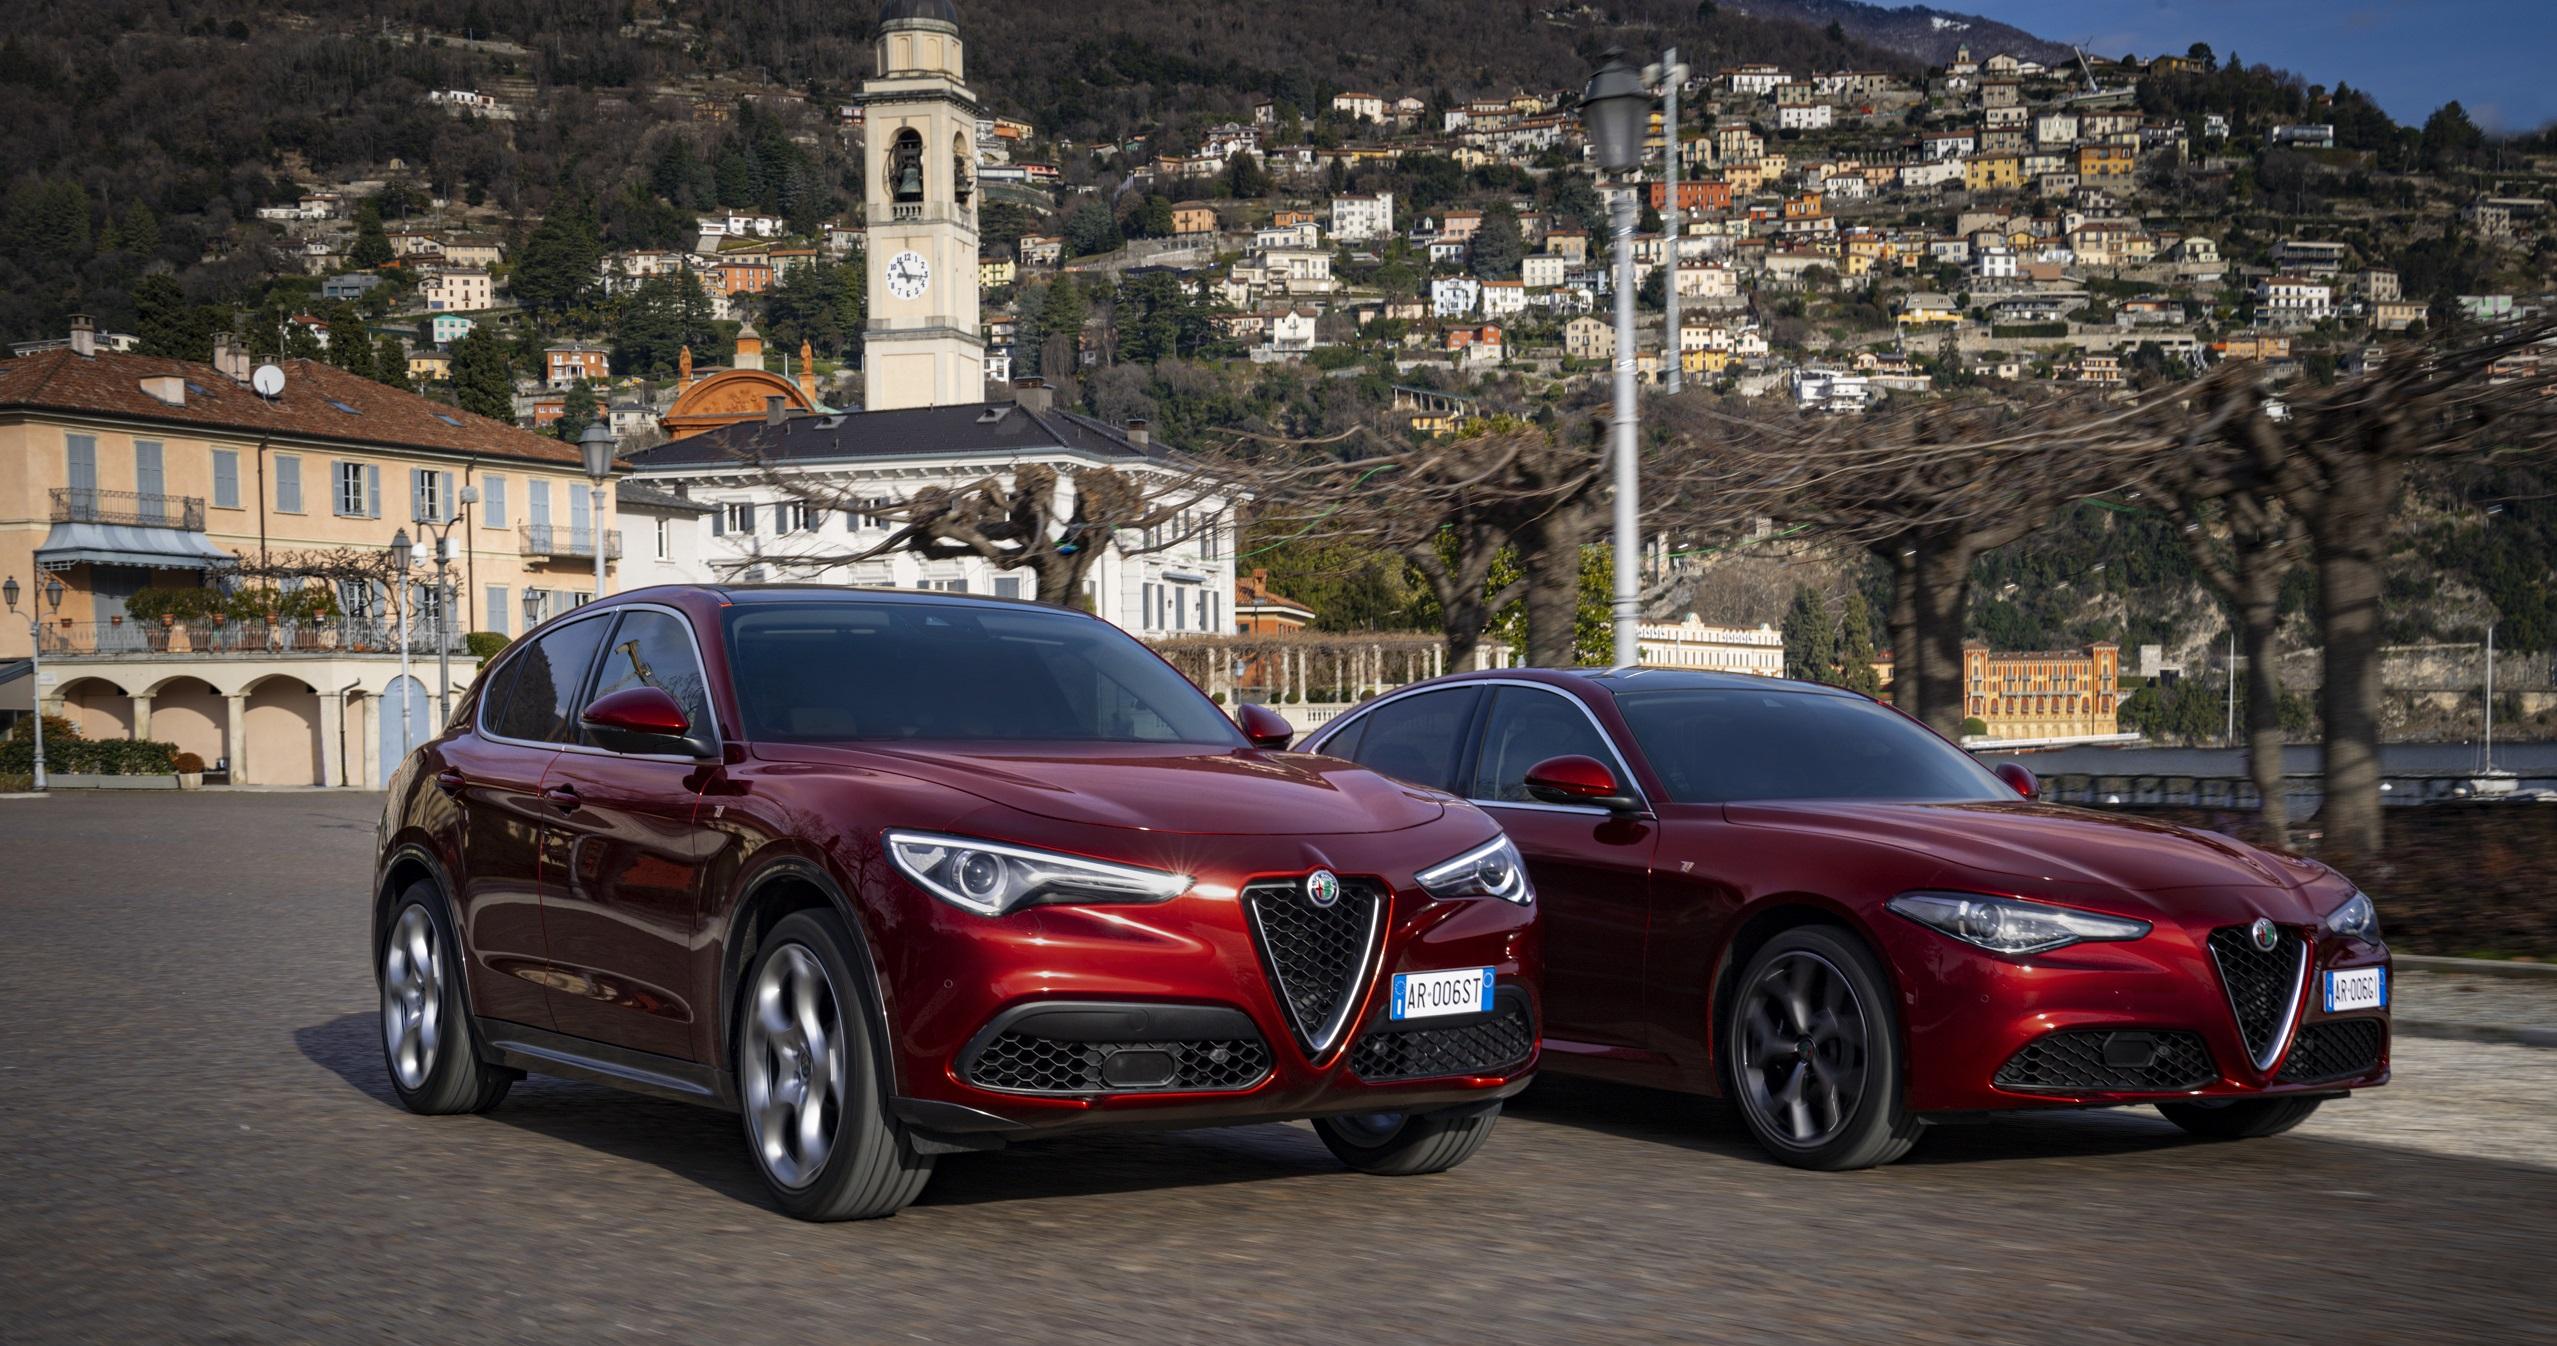 Özel seri Alfa Romeo'lar